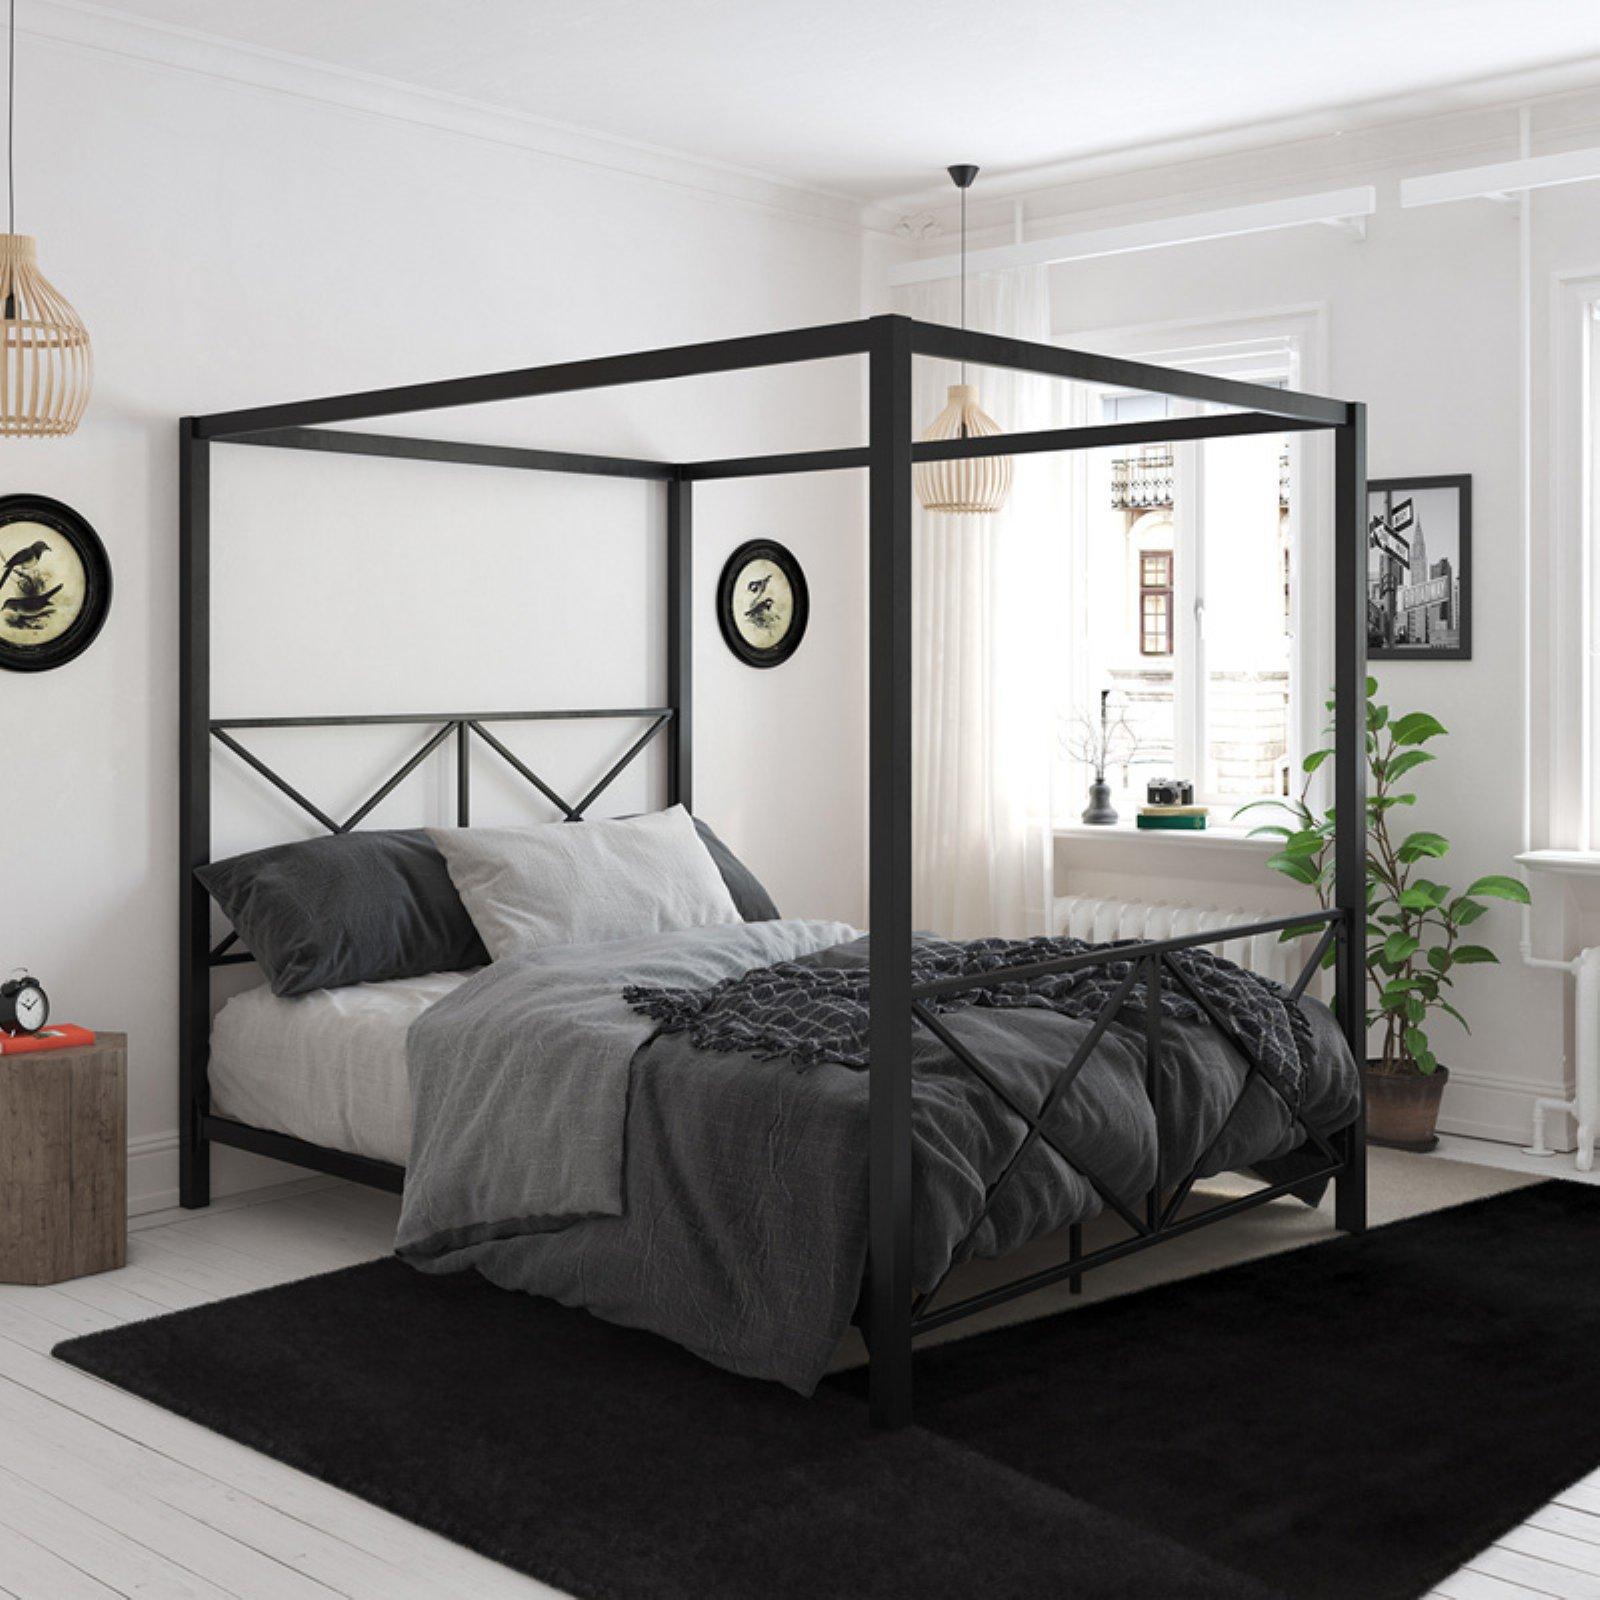 DHP Rosedale Metal Canopy Bed Frame Multiple Sizes Multiple Colors & Canopy Bed Frames